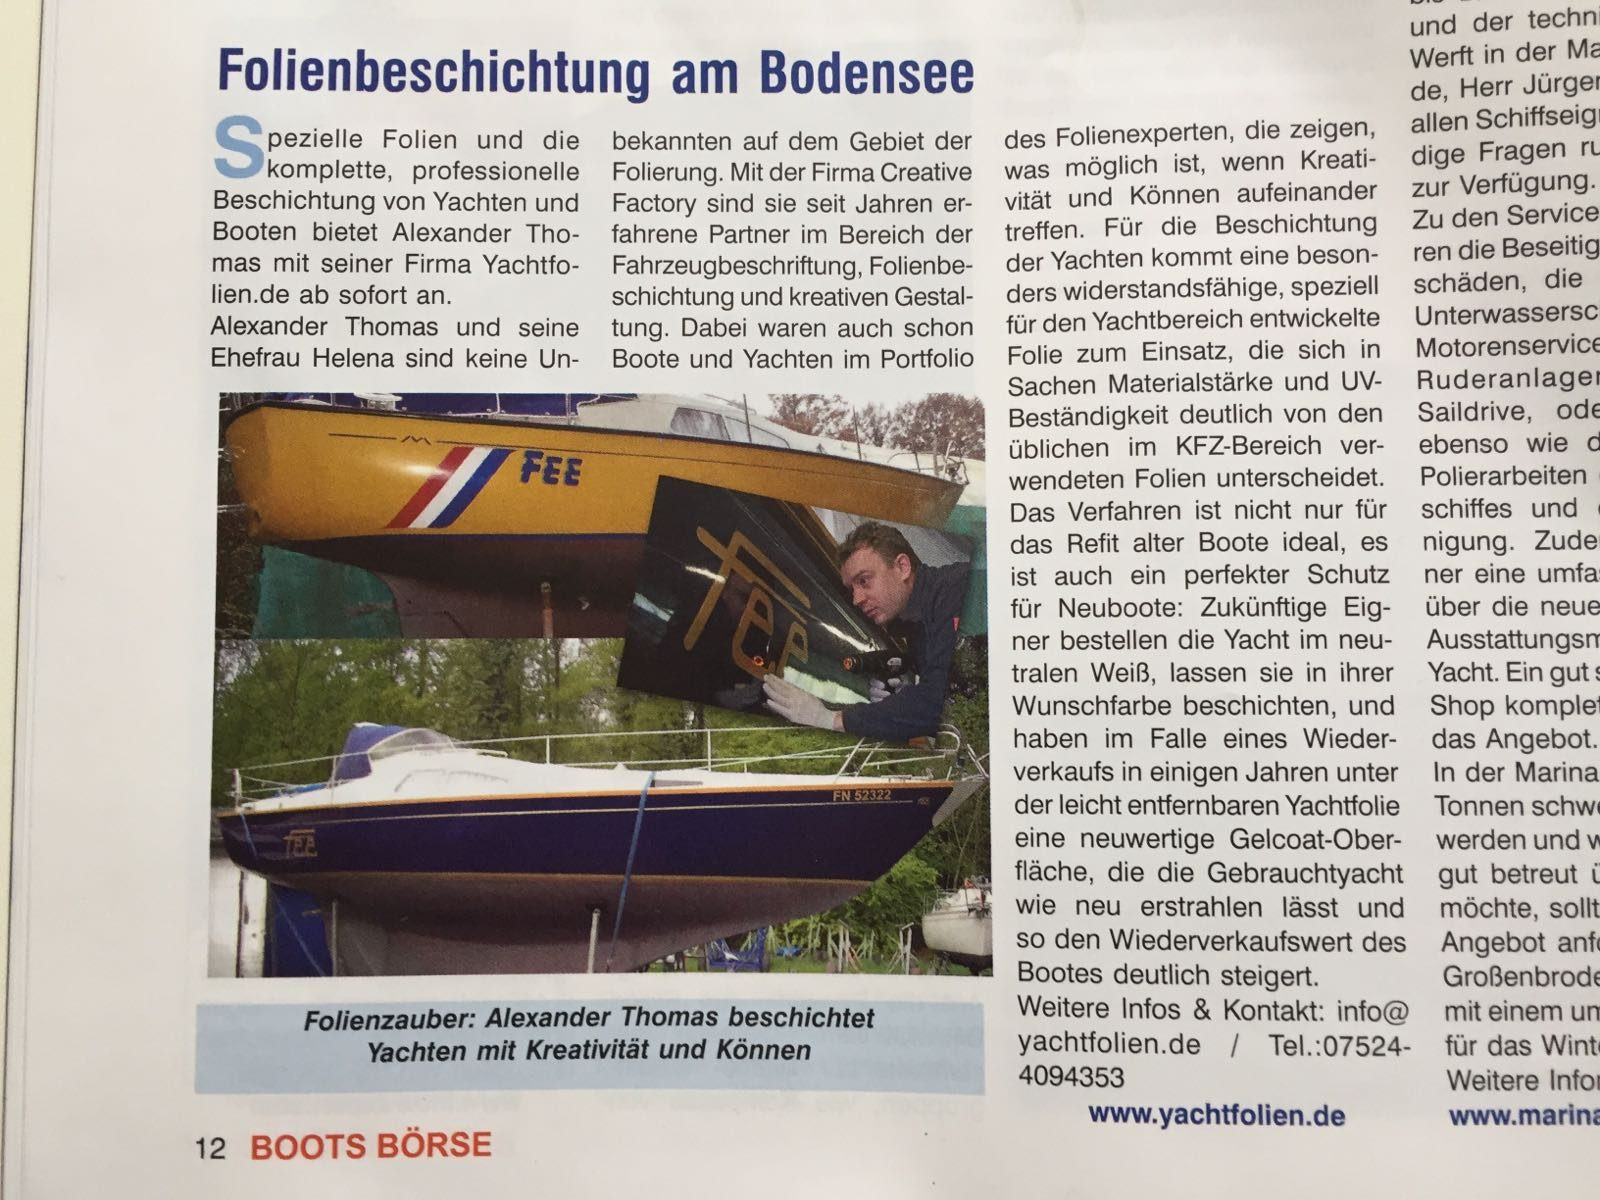 yachtfolien-de-pressebericht